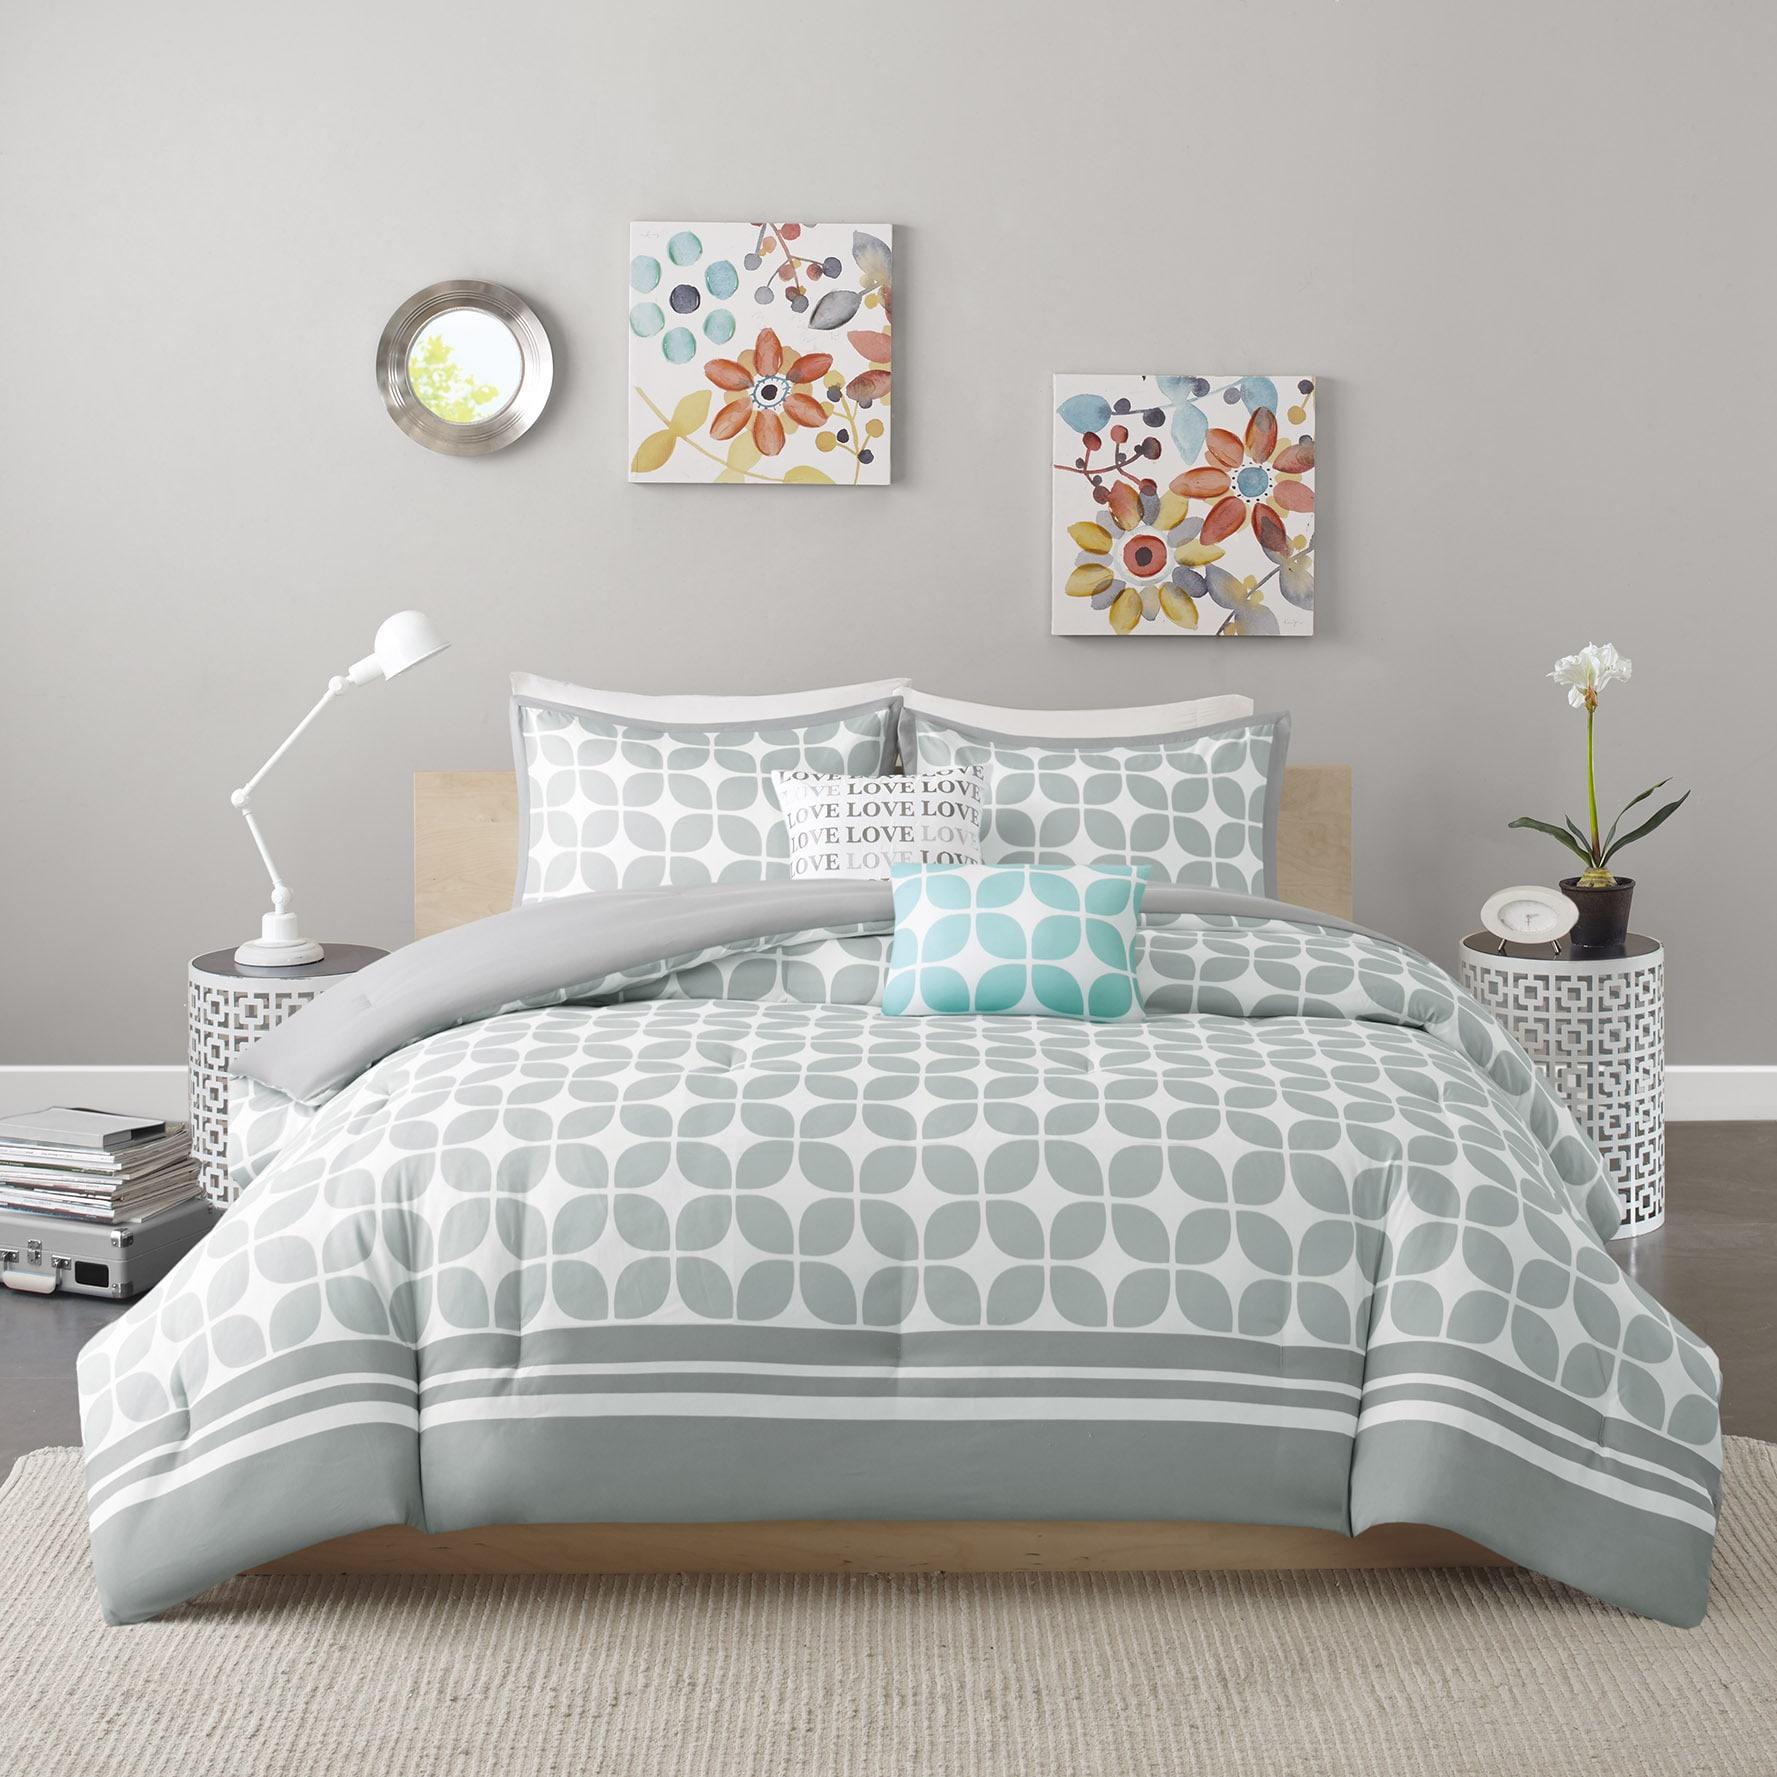 bedding product com city cotton free variegated comforter piece scene bed set pleats bath overstock